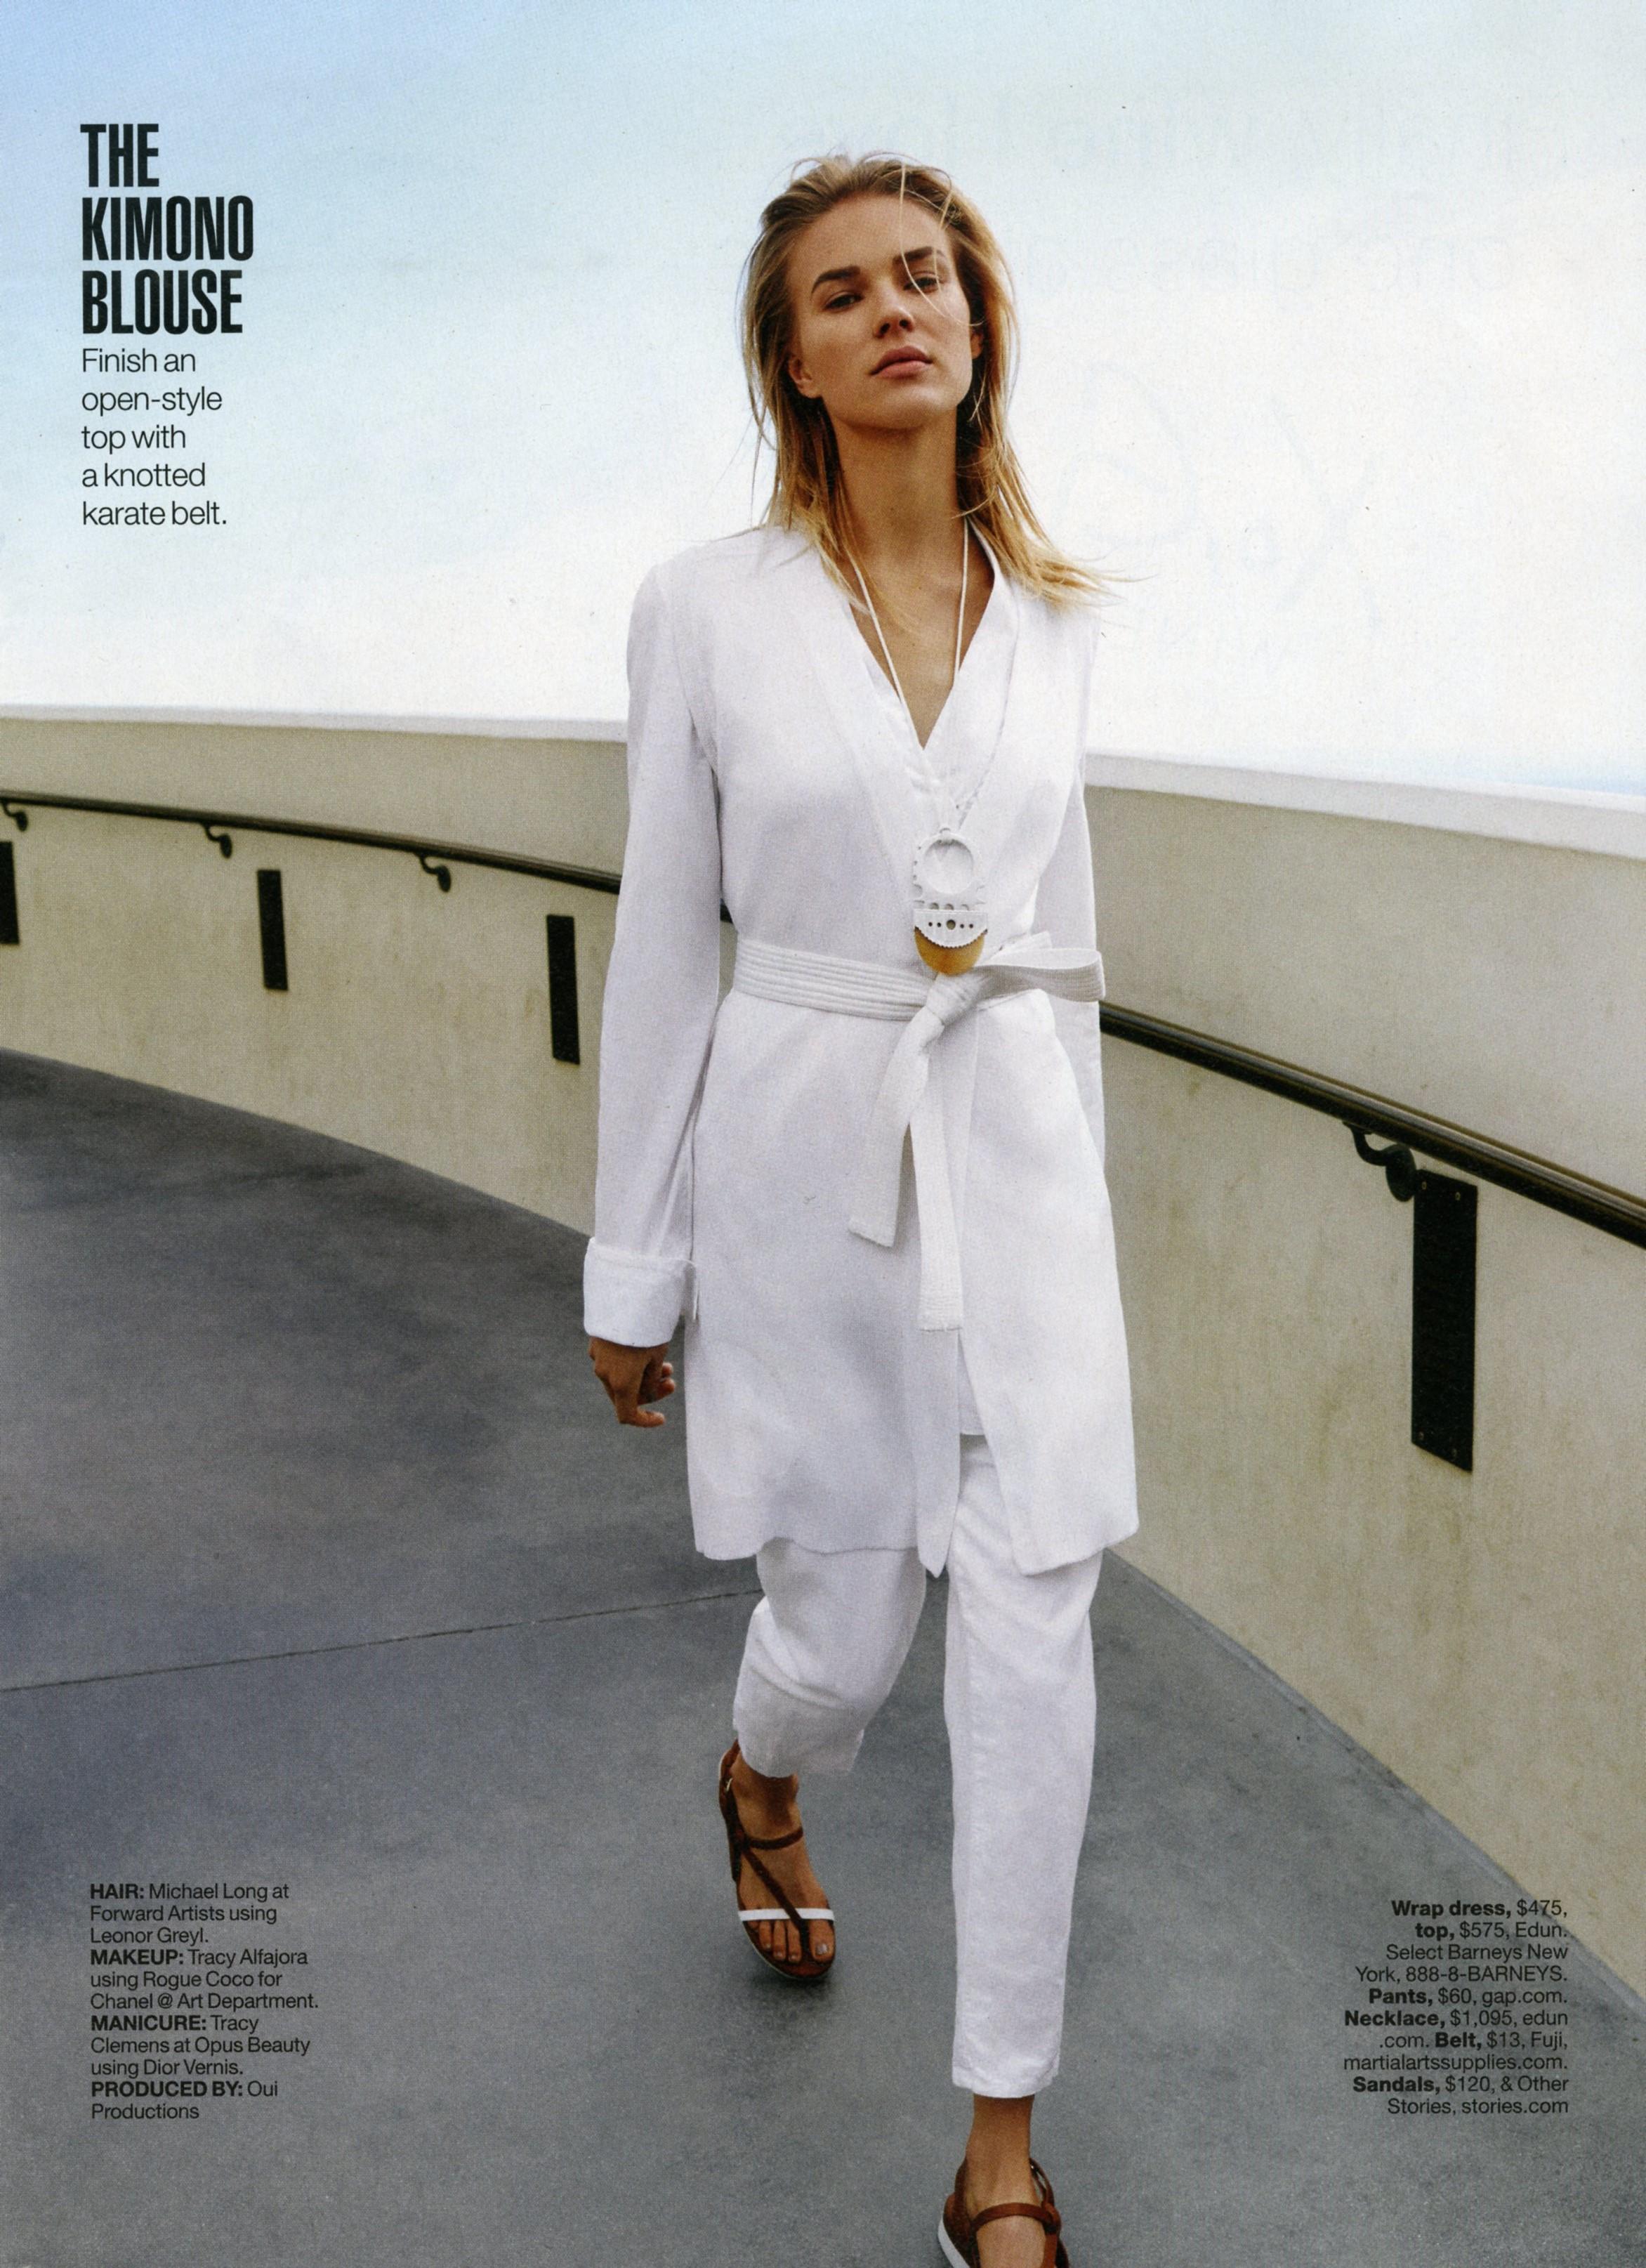 HD wallpapers hair magazine pdf